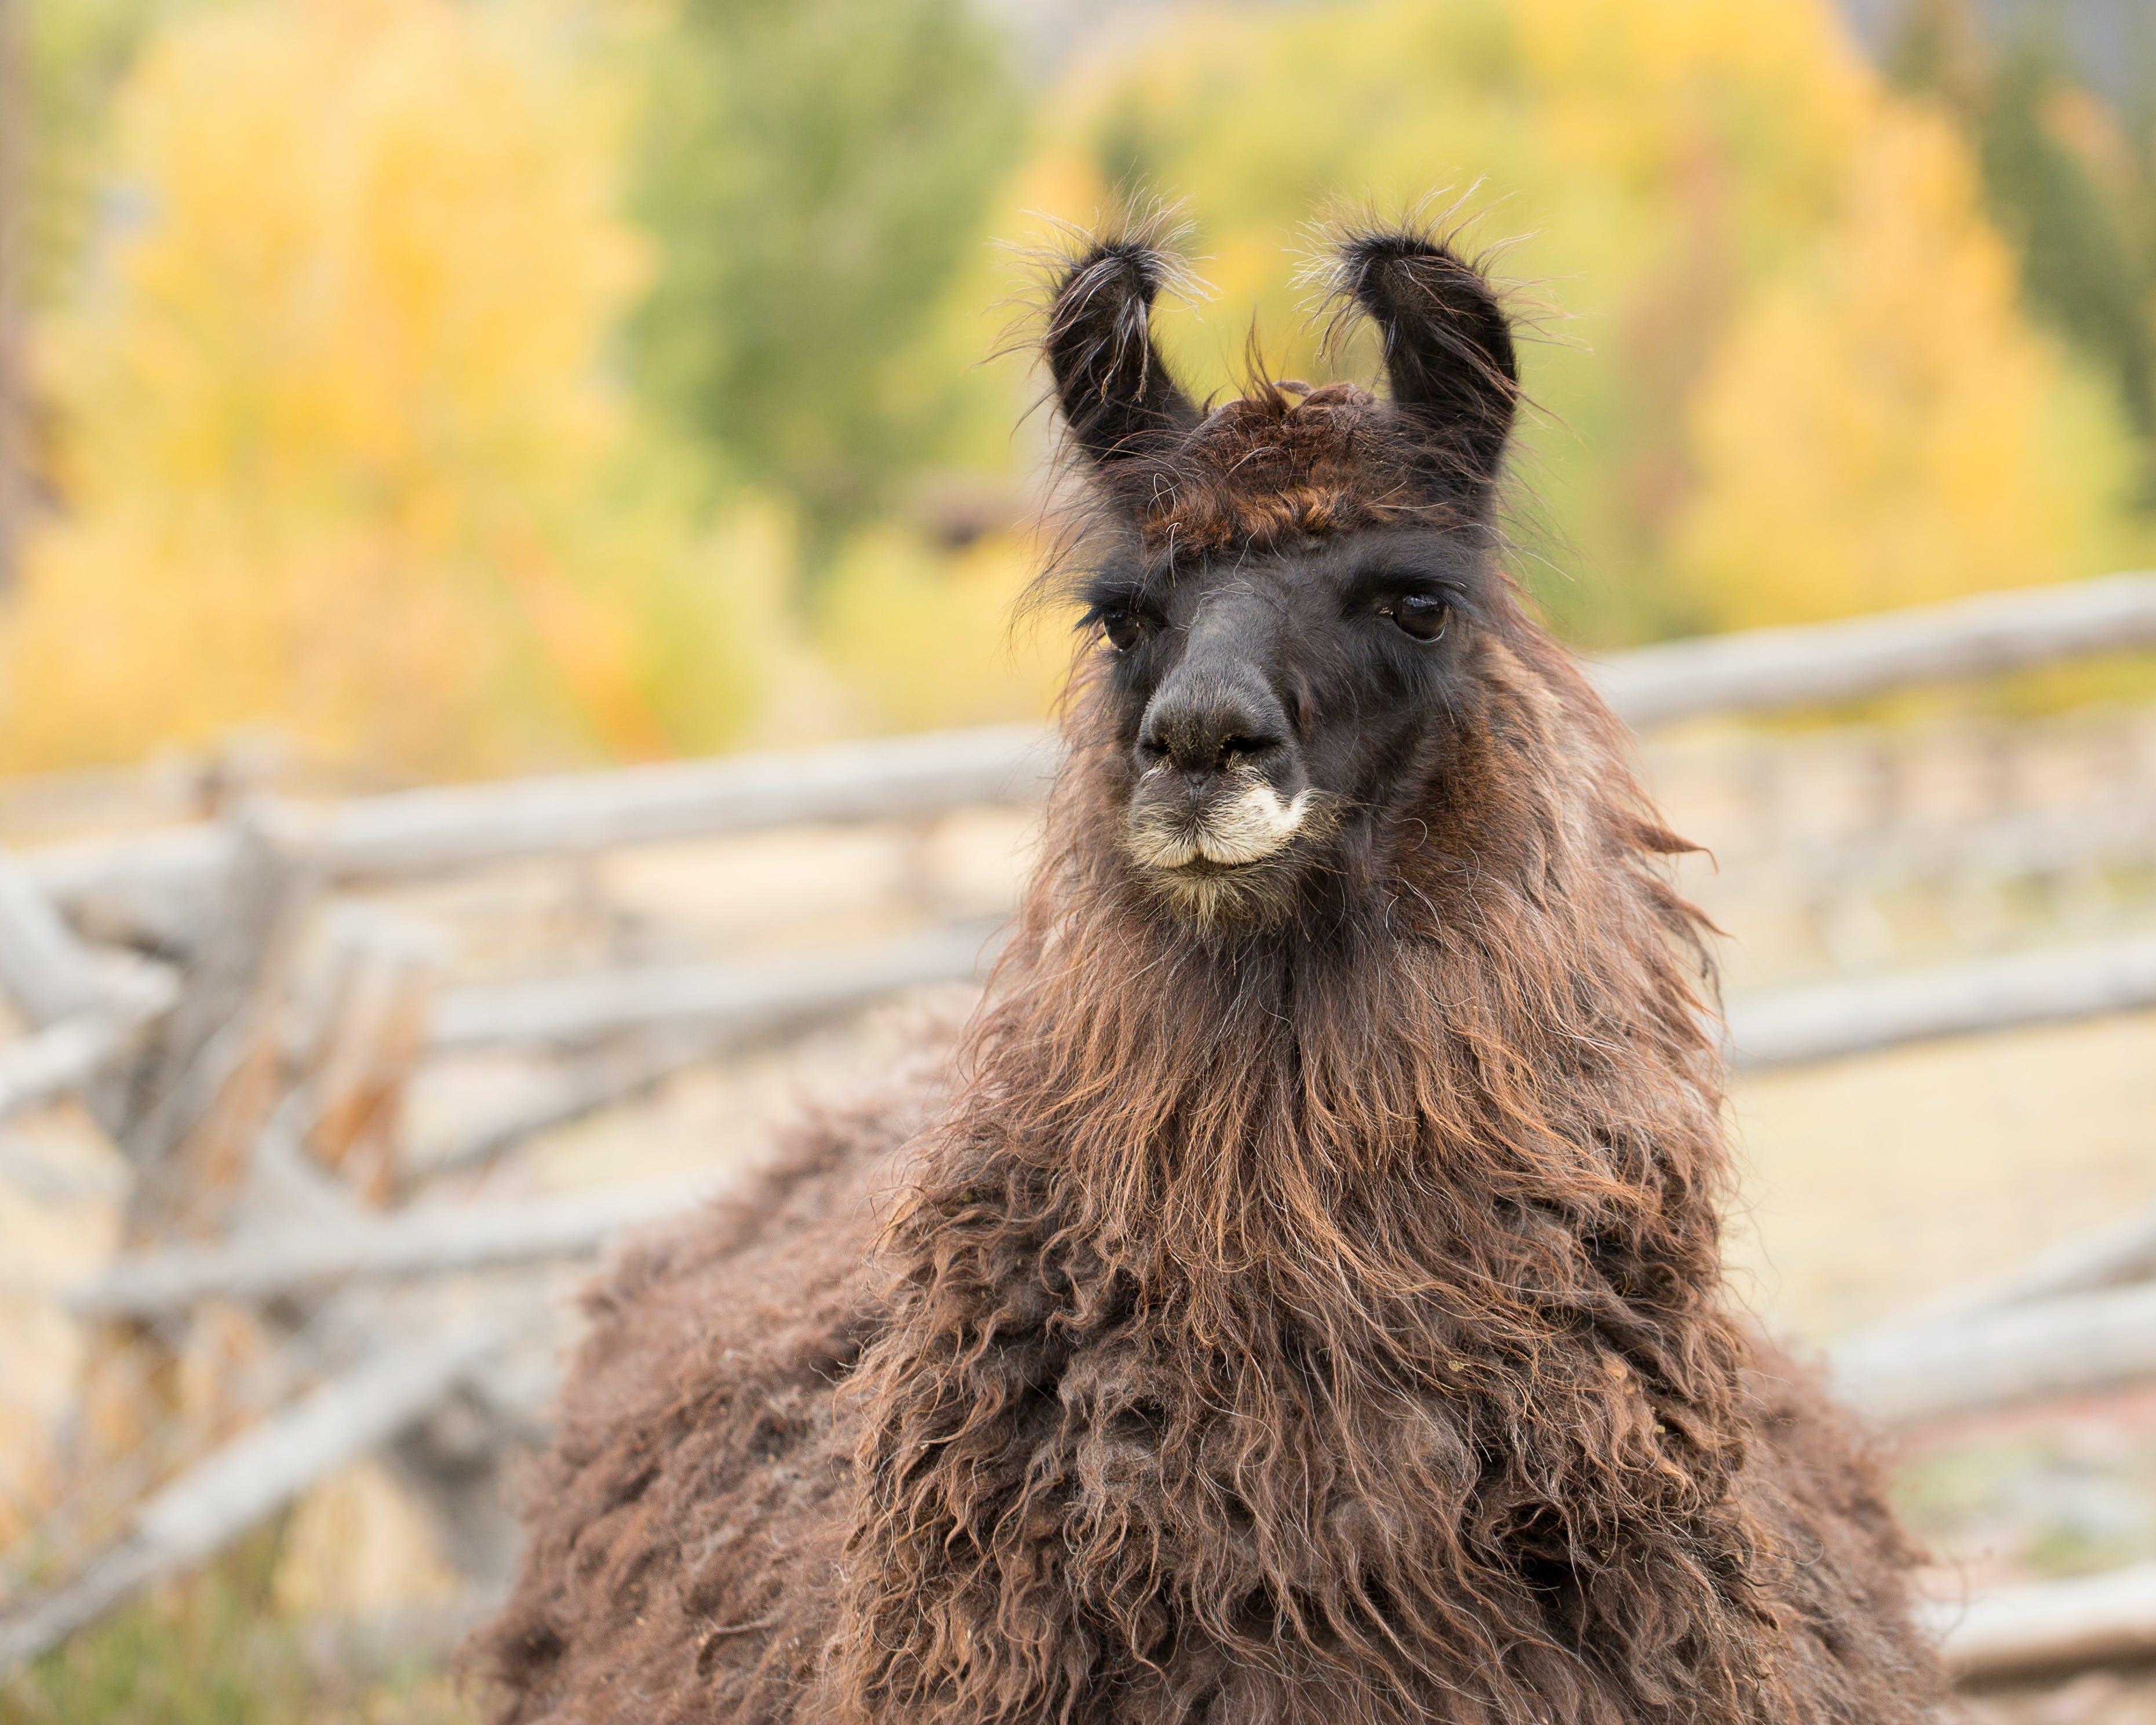 Free stock photo of domestic animal, domestic animals, farm animals, llama